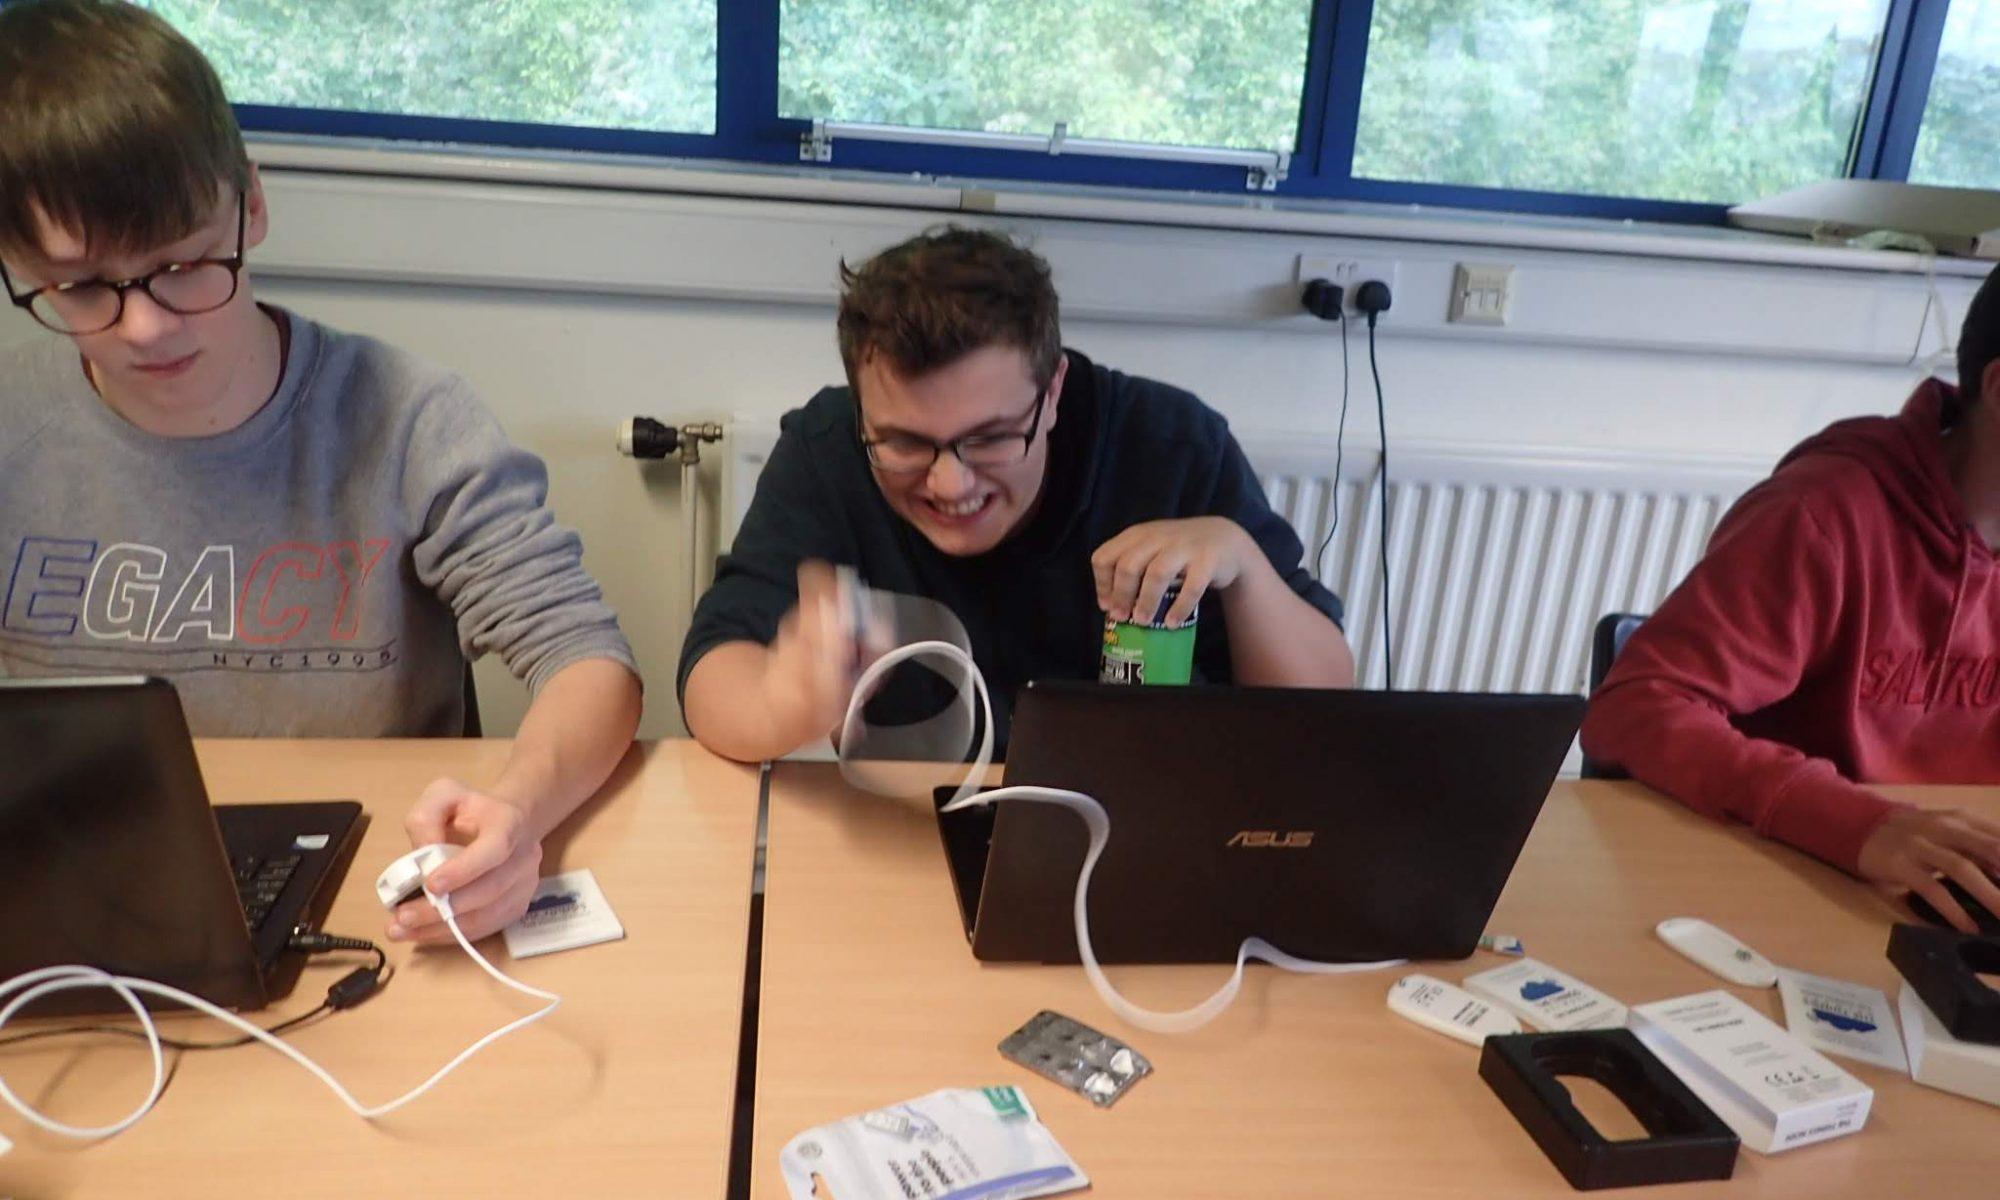 Student vigorously shaking a motion sensor